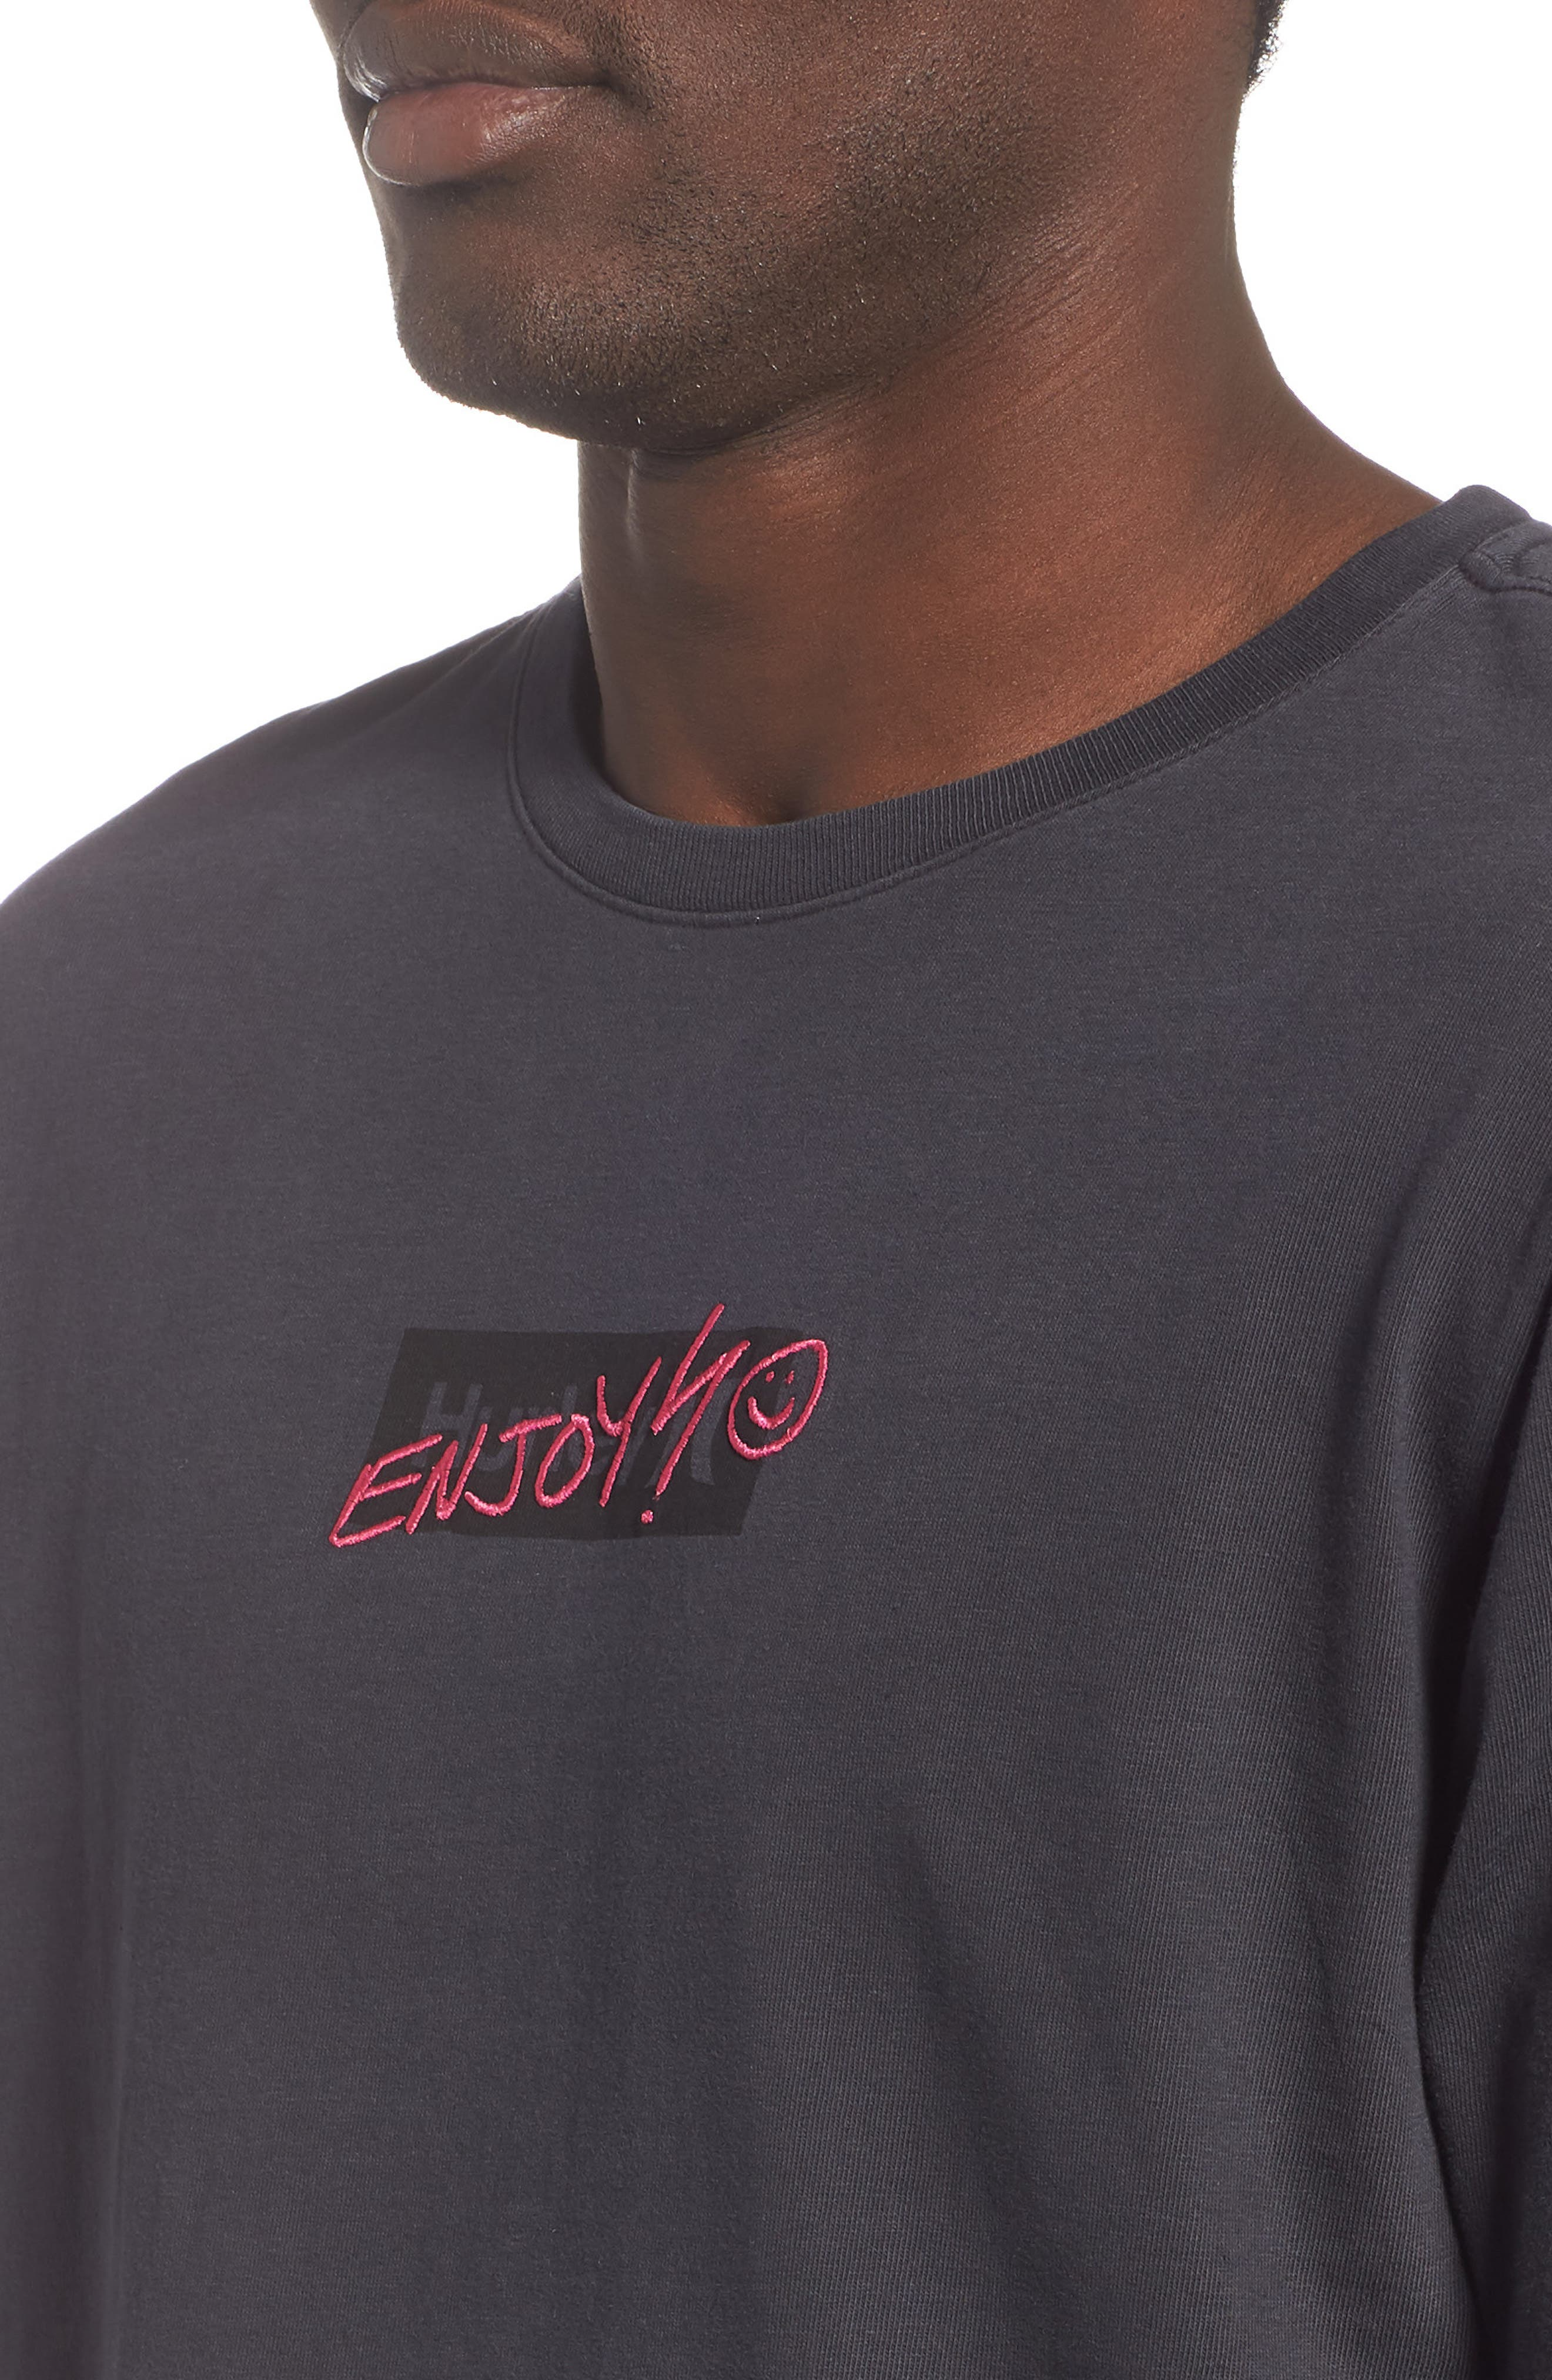 Heavy Enjoy Graphic T-Shirt,                             Alternate thumbnail 4, color,                             ANTHRACITE